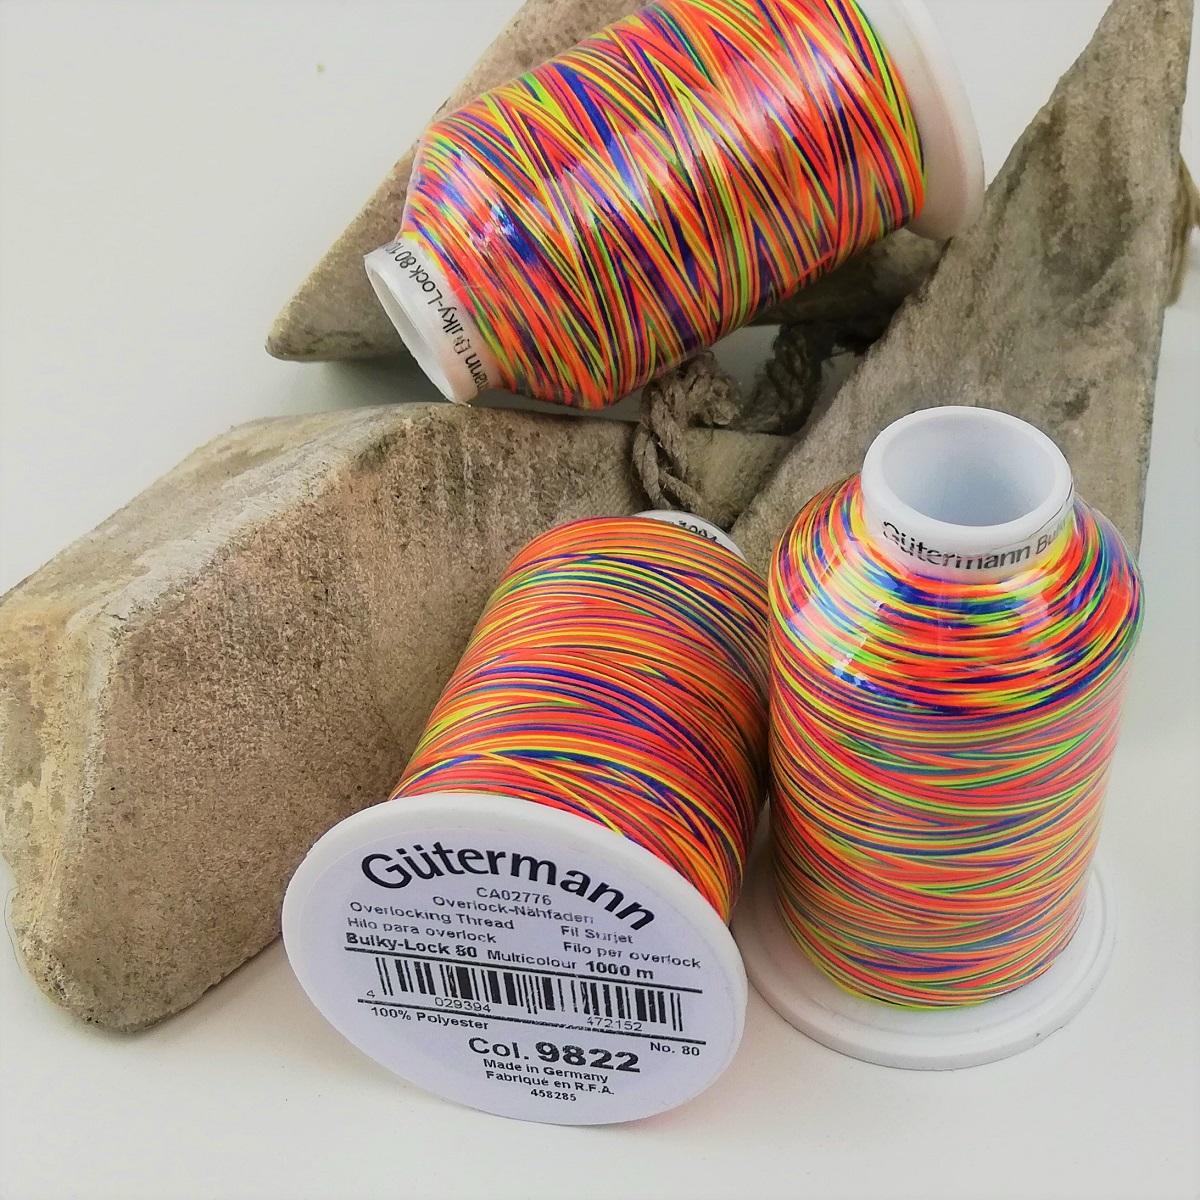 "Gütermann Bauschgarn Bulky-Lock 80 Multicolor ""Rainbow"" 9822, 1000m"